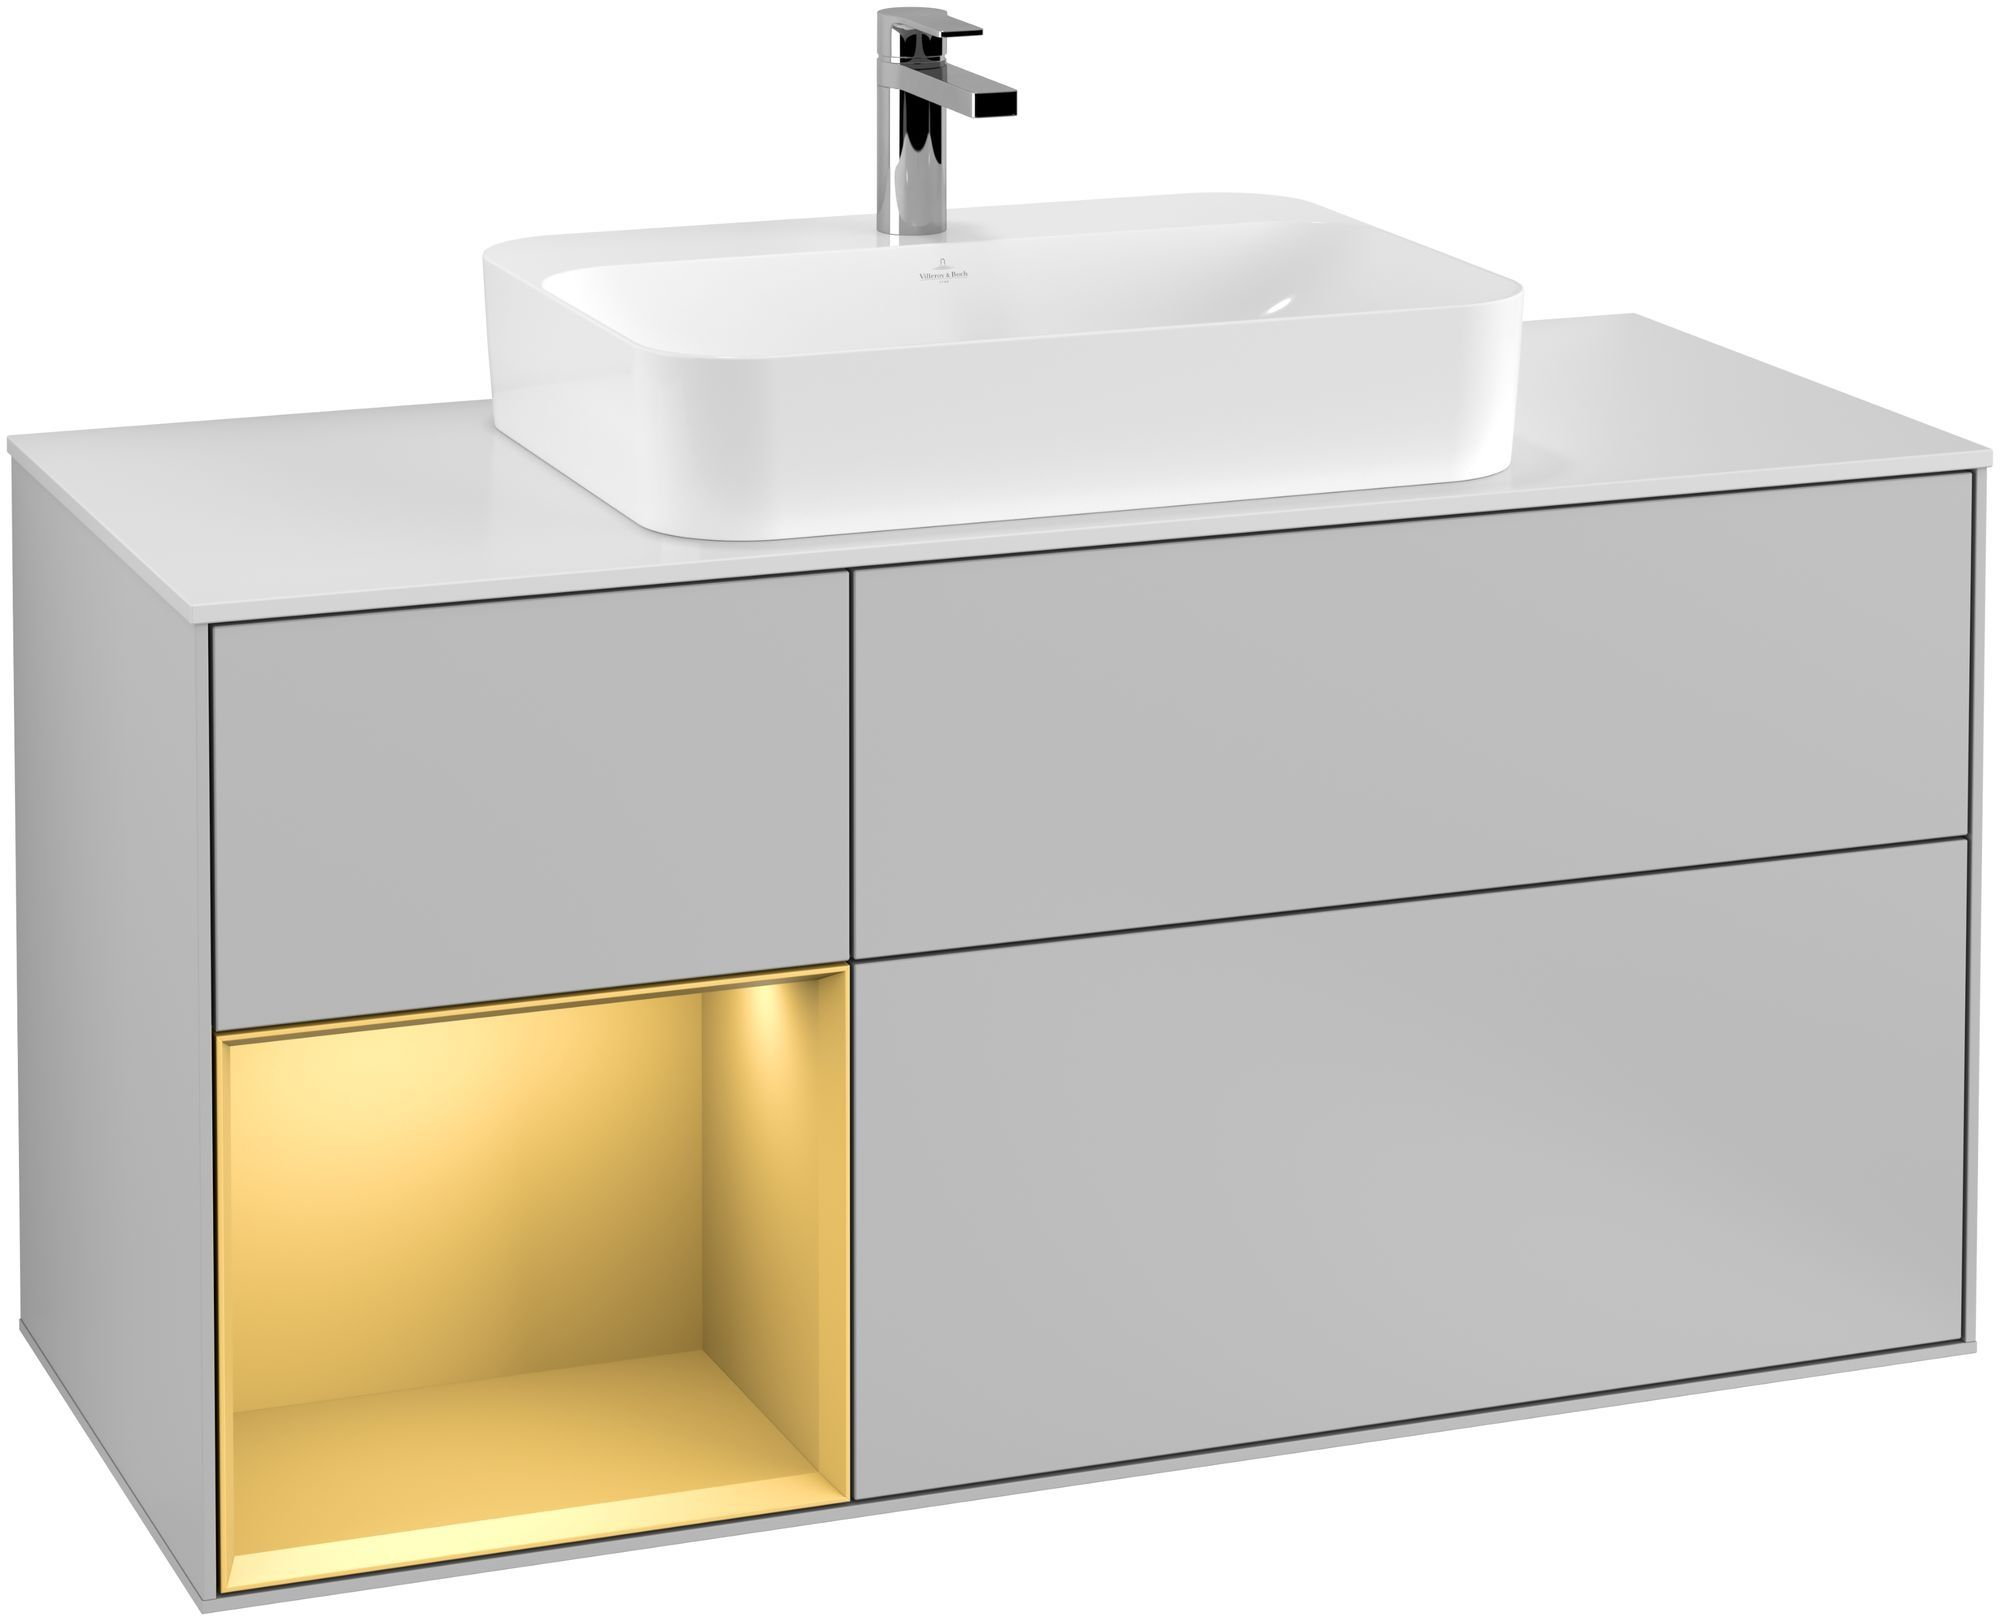 Villeroy & Boch Finion G41 Waschtischunterschrank mit Regalelement 3 Auszüge Waschtisch mittig LED-Beleuchtung B:120xH:60,3xT:50,1cm Front, Korpus: Light Grey Matt, Regal: Gold Matt, Glasplatte: White Matt G411HFGJ